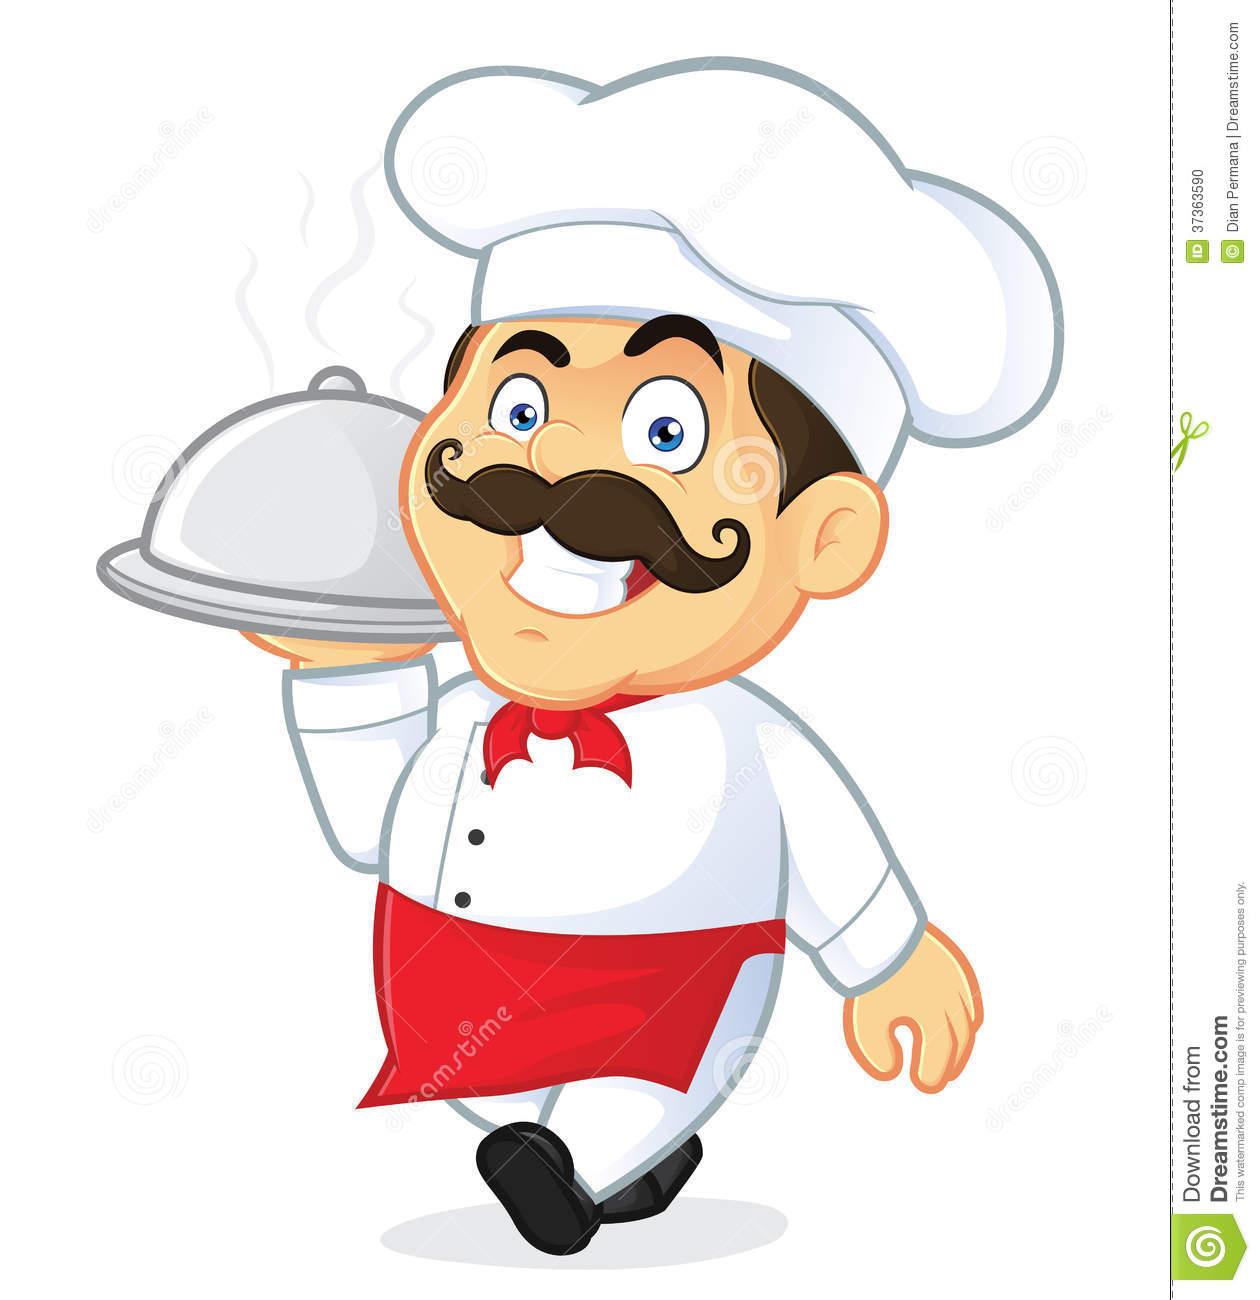 chef clip art video clipart panda free clipart images chef clip art free printable images chef clip art free printable images